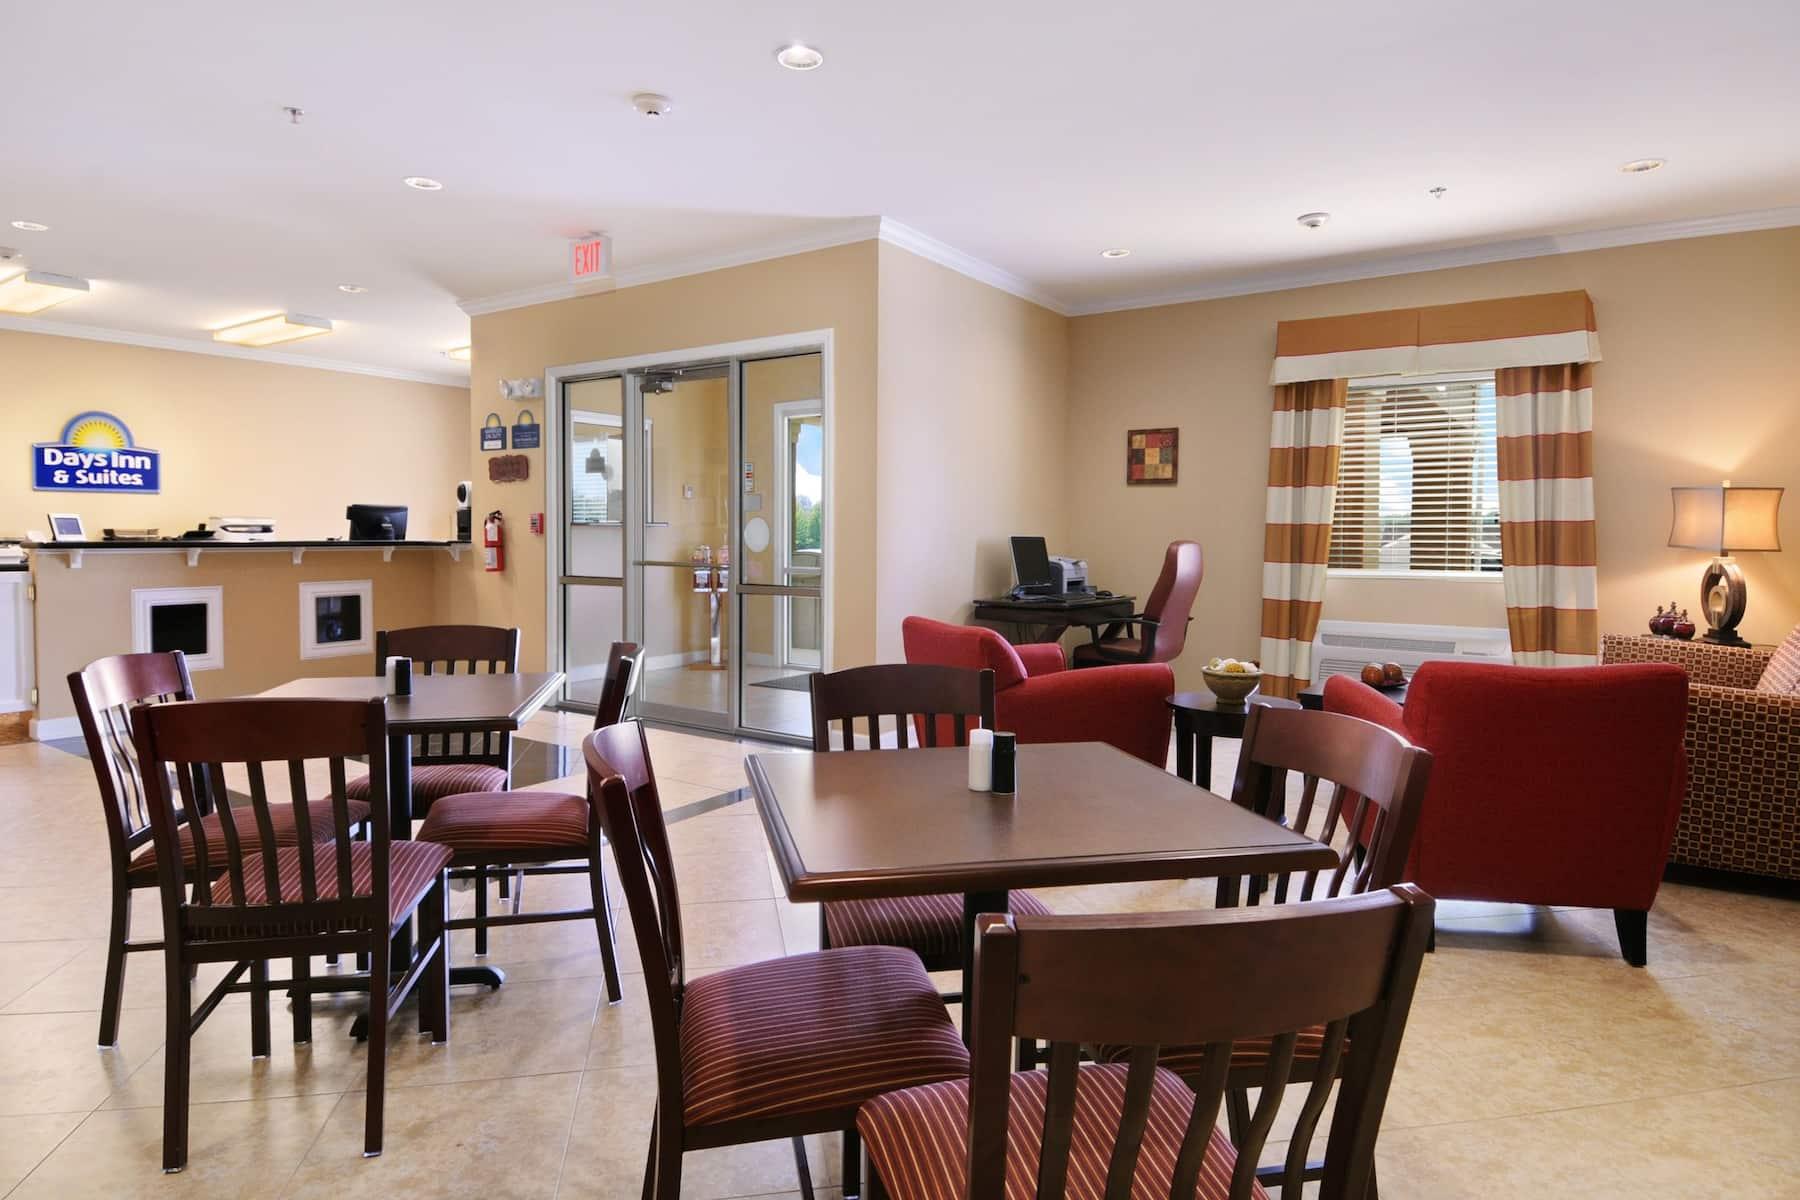 Days Inn & Suites by Wyndham Cabot hotel lobby in Cabot, Arkansas